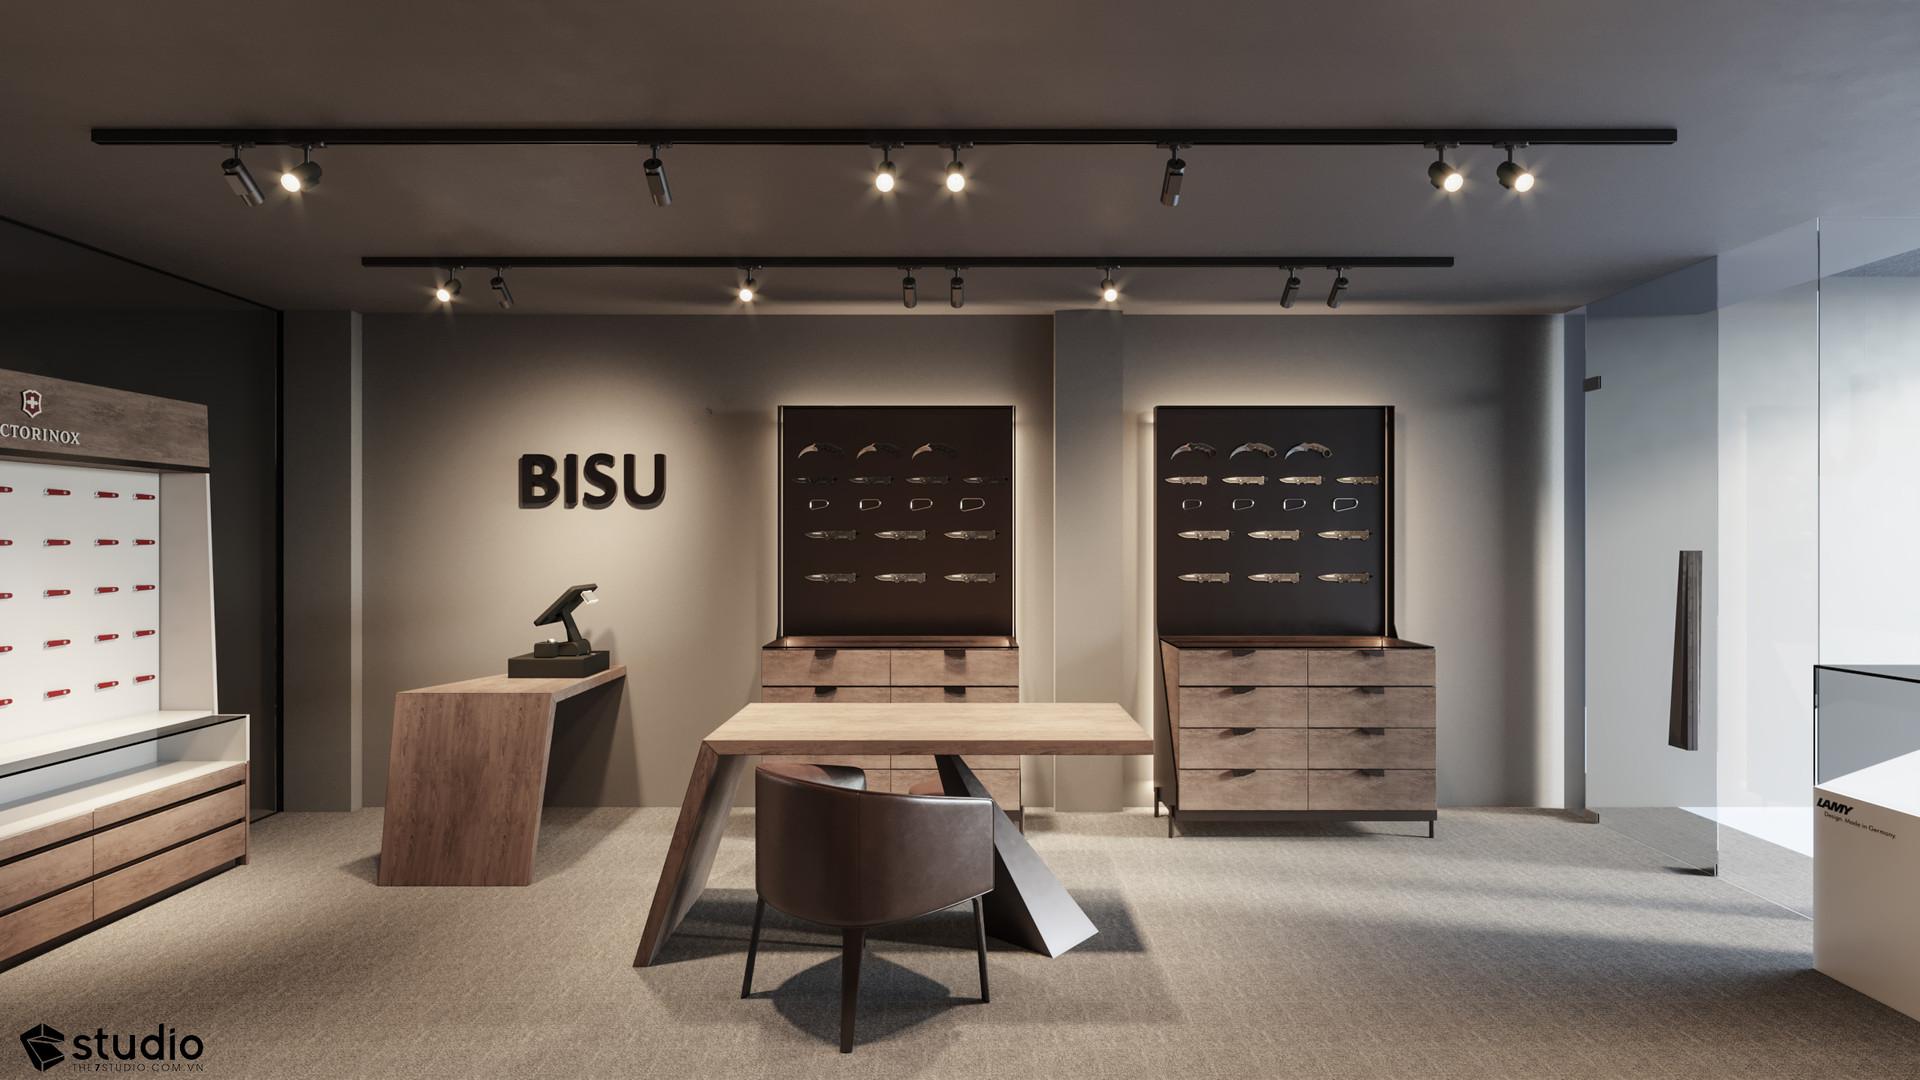 BISU Store